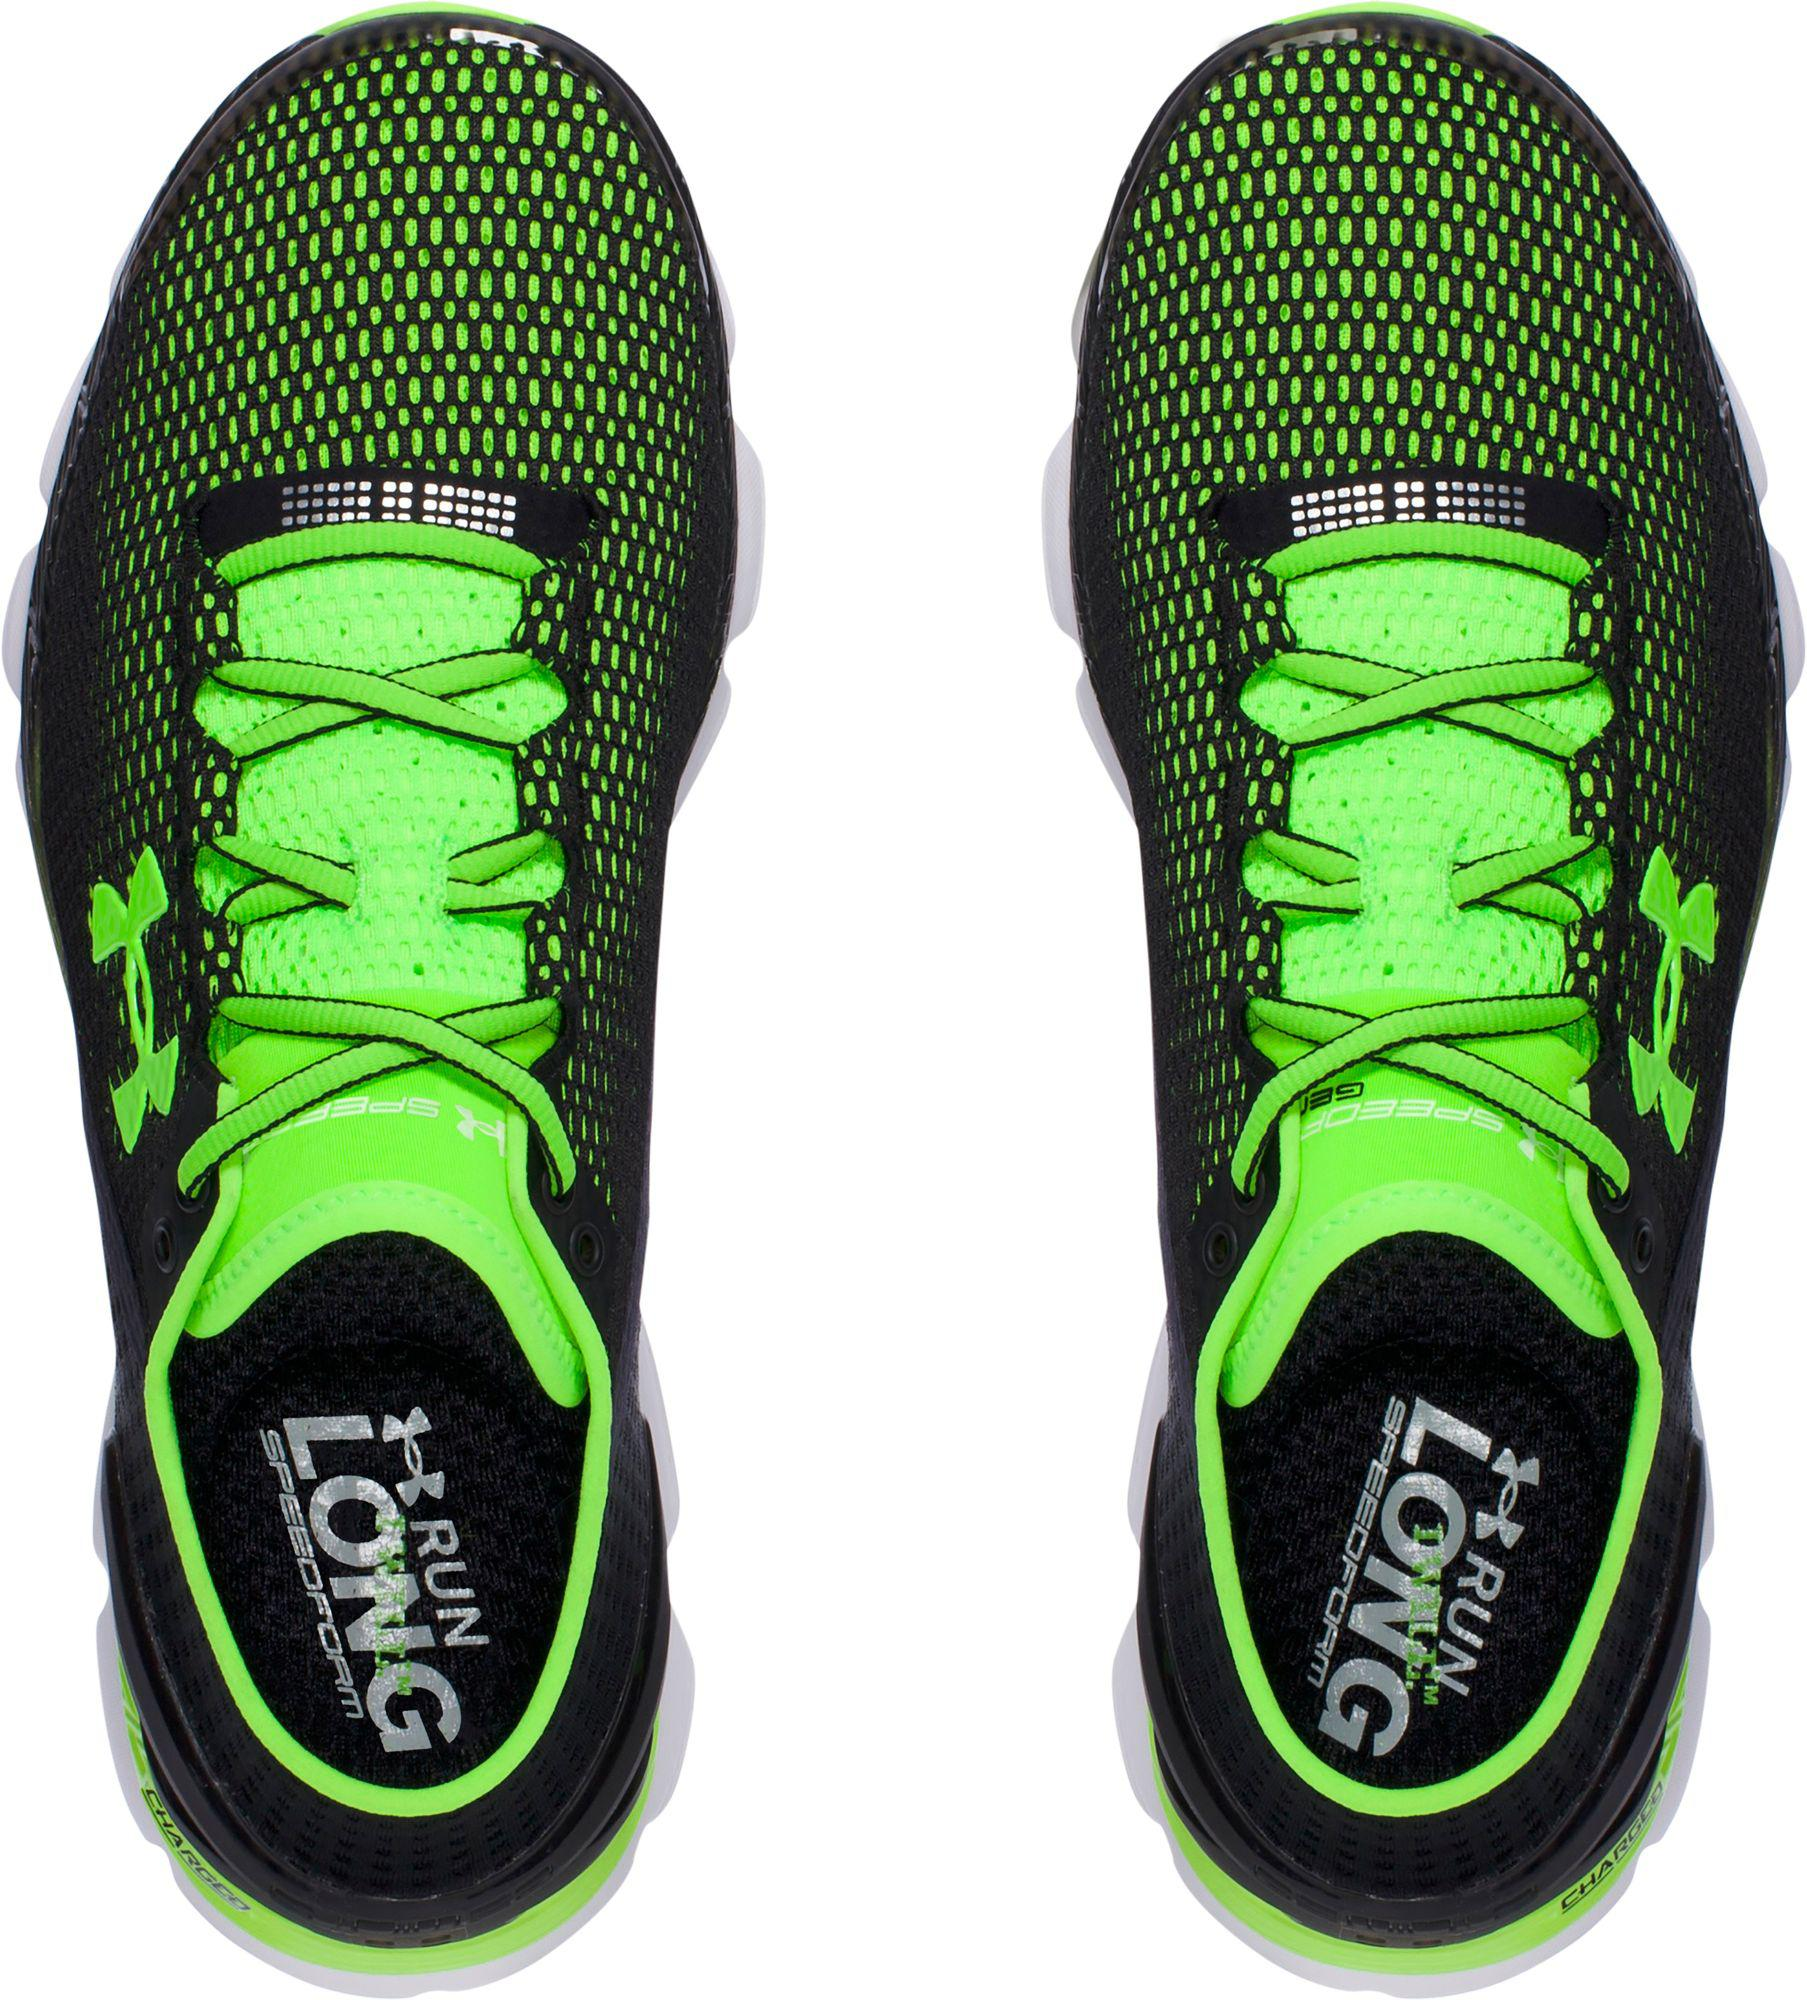 official photos cada9 be51c Men's Green Speedform Gemini 2.1 Running Shoes